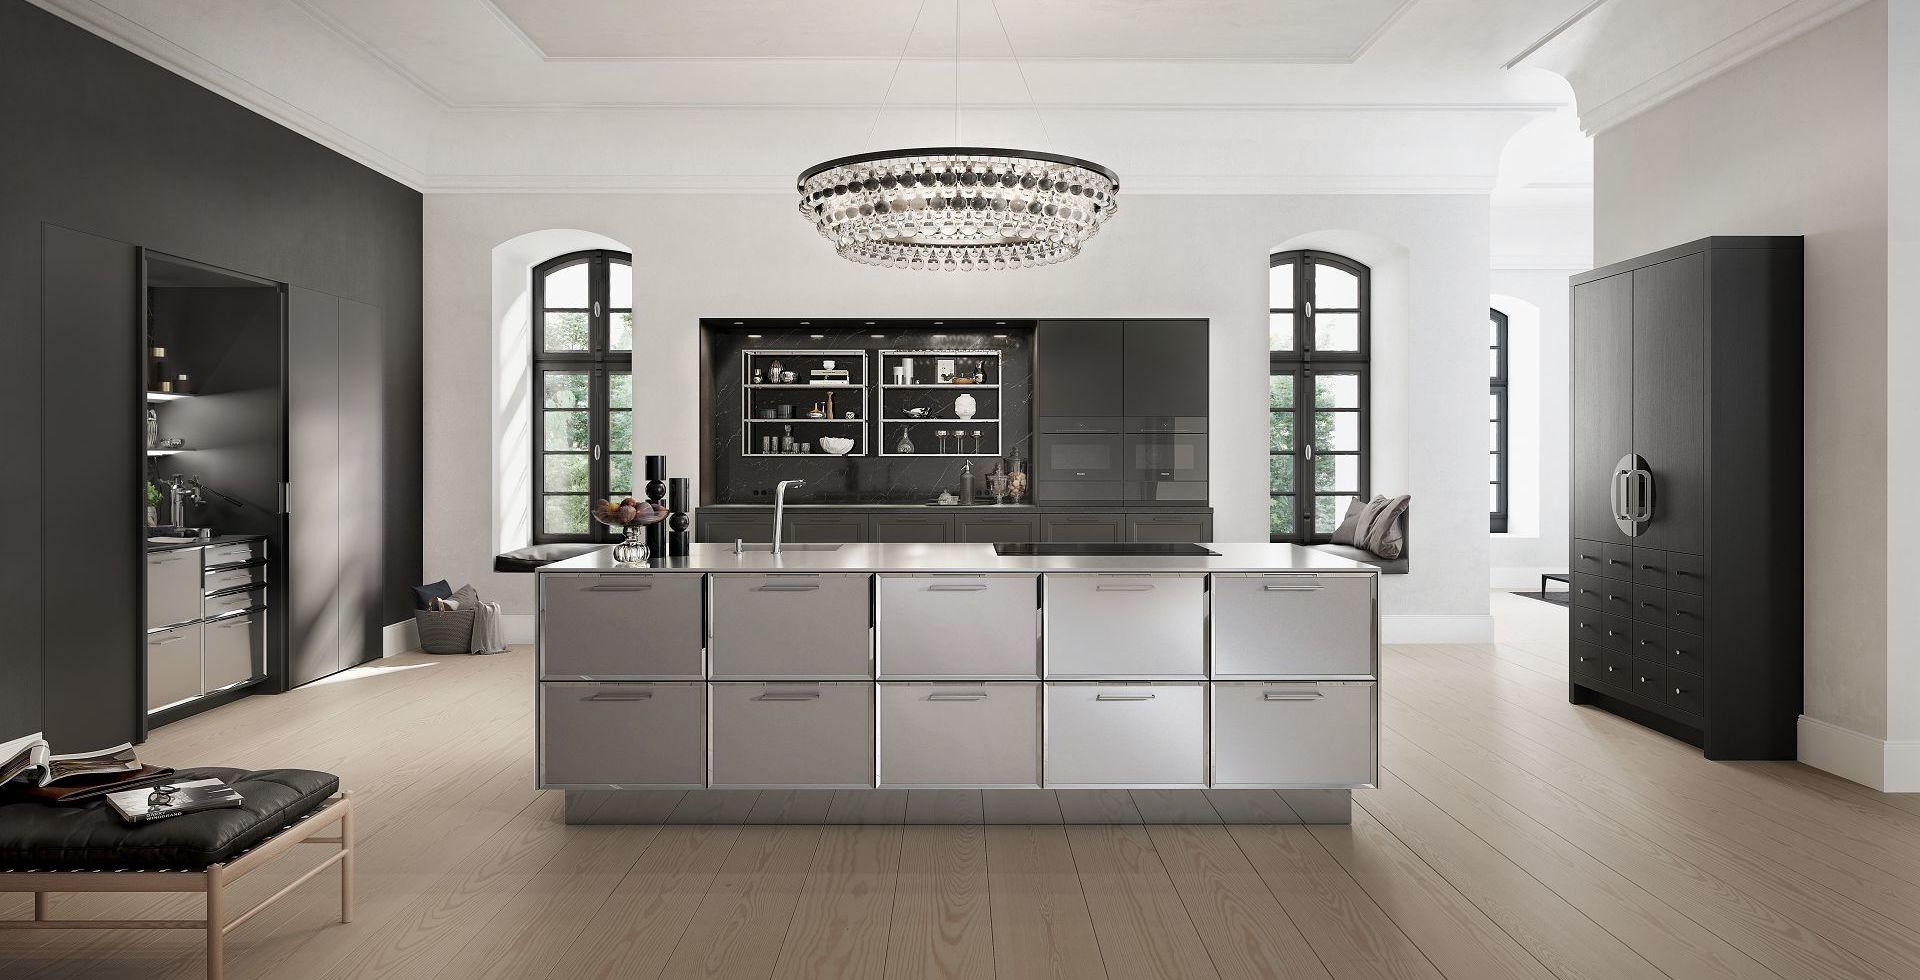 siematic classic klassisches k chendesign neu komponiert. Black Bedroom Furniture Sets. Home Design Ideas